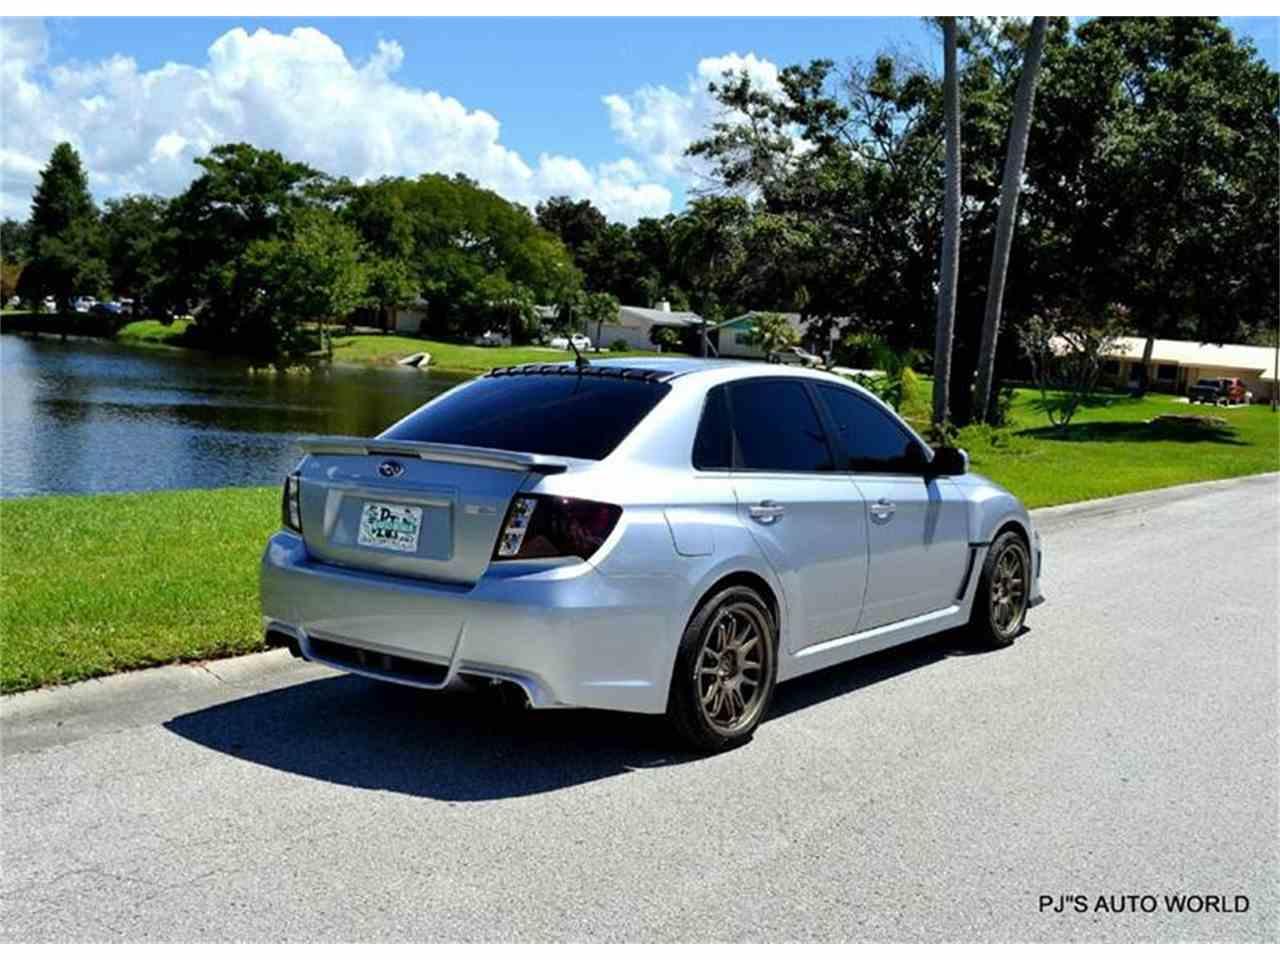 Large Picture of 2013 Subaru Impreza located in Clearwater Florida - J6WM